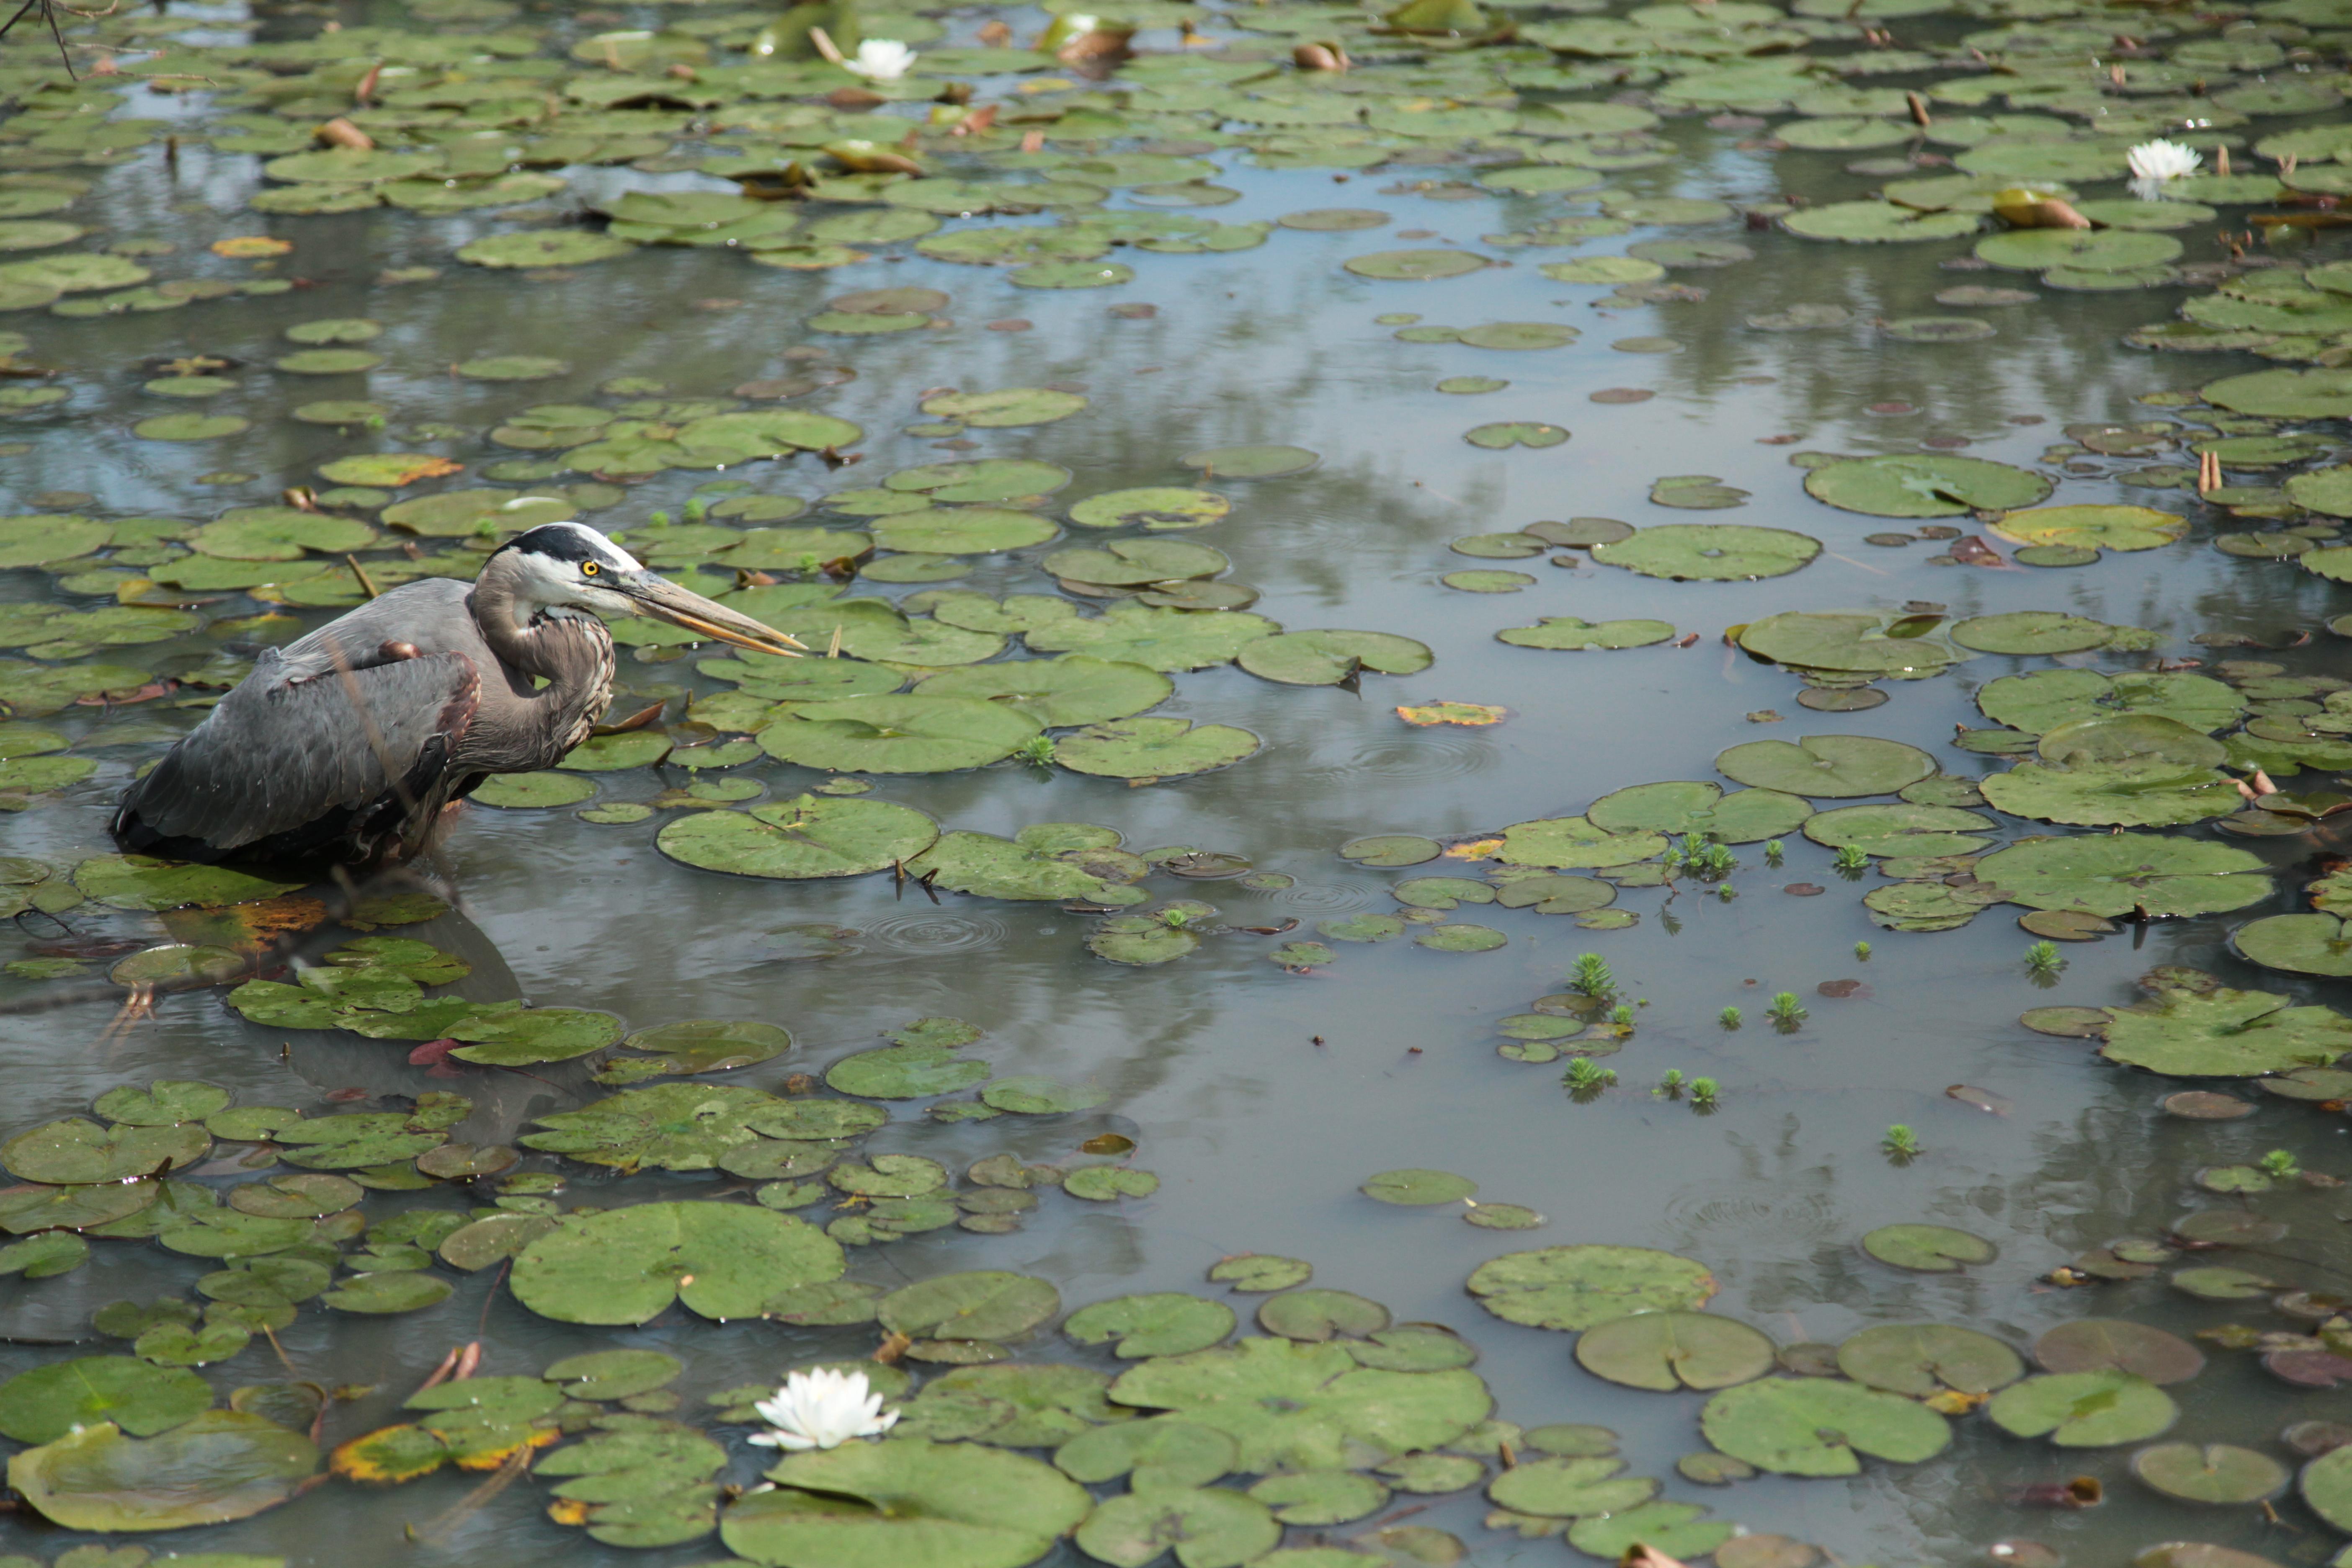 Birds Kenilworth Park Aquatic Gardens US National Park Service